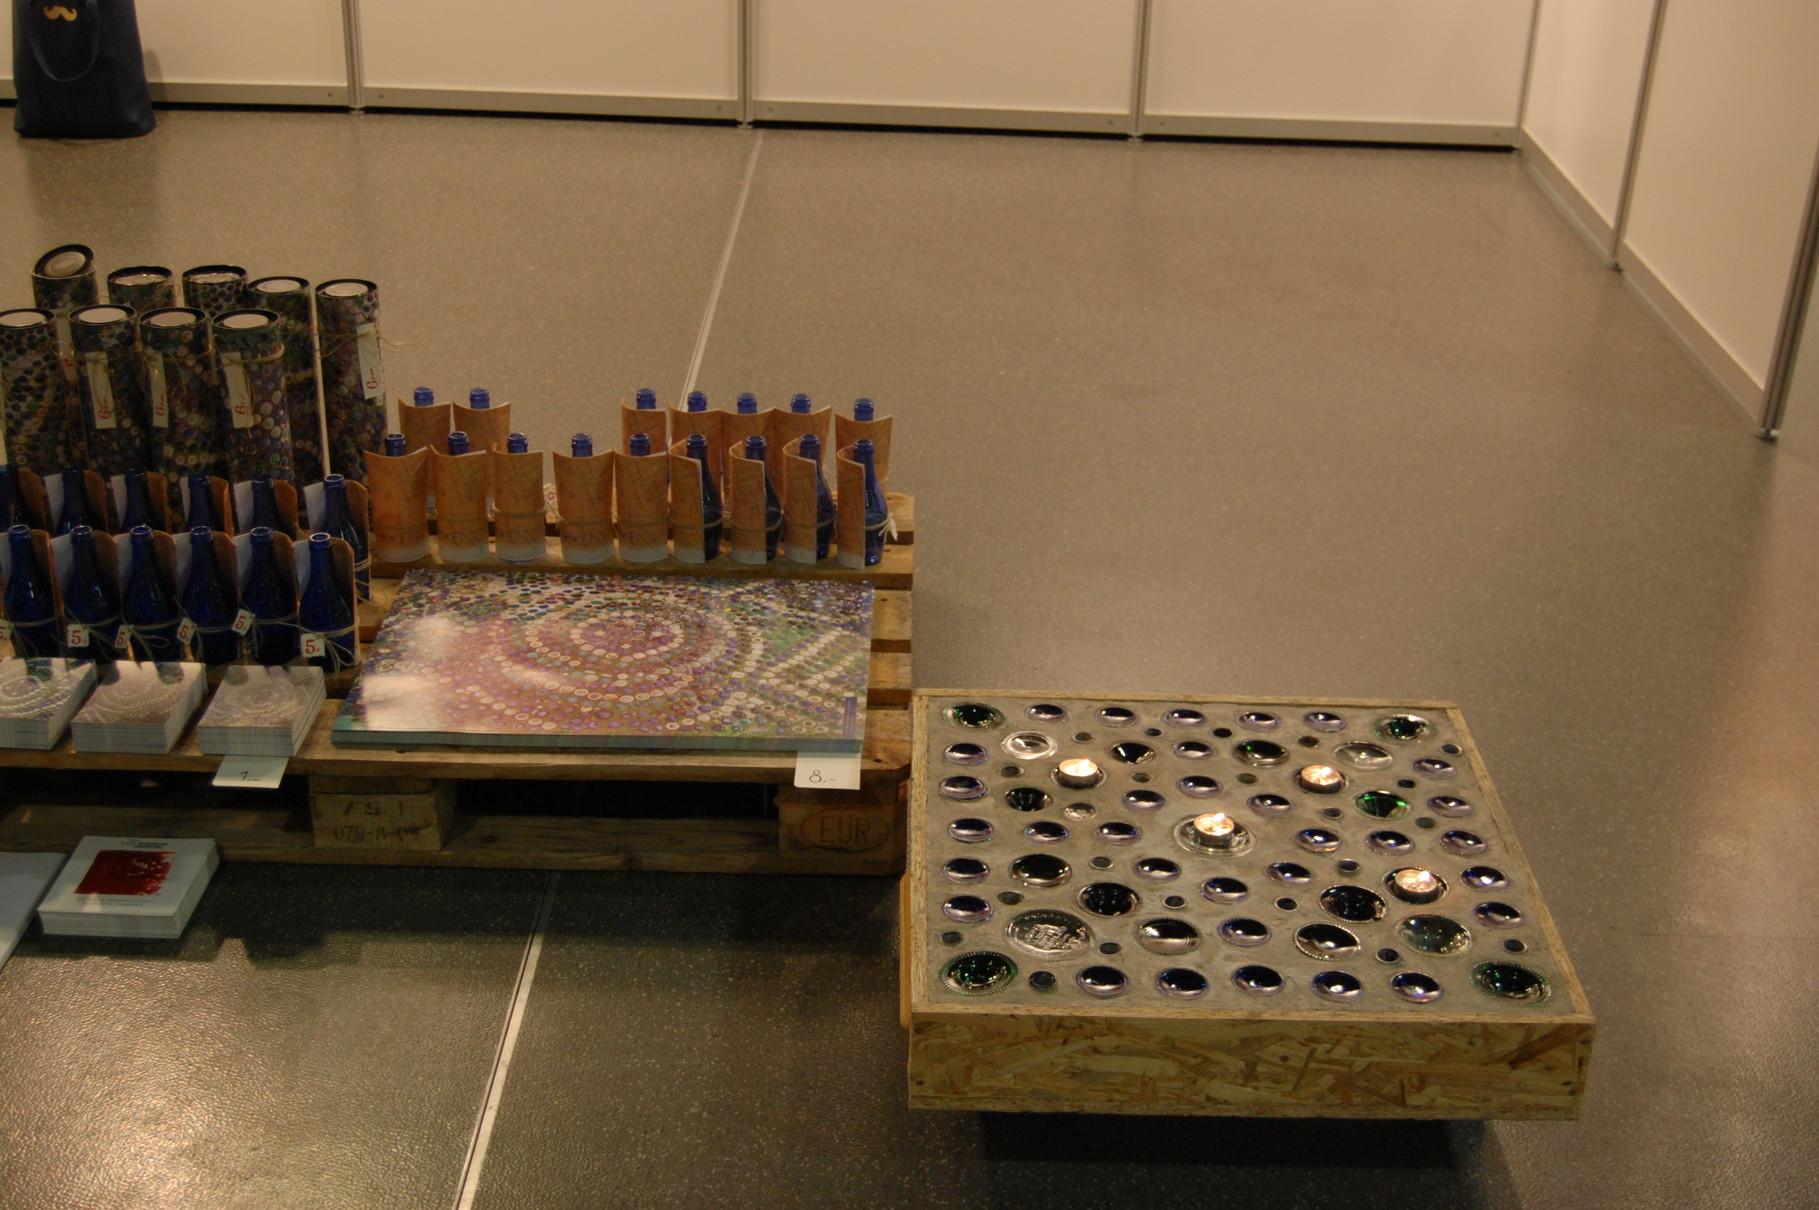 Megi Blzer, Ausstellung in Kiel